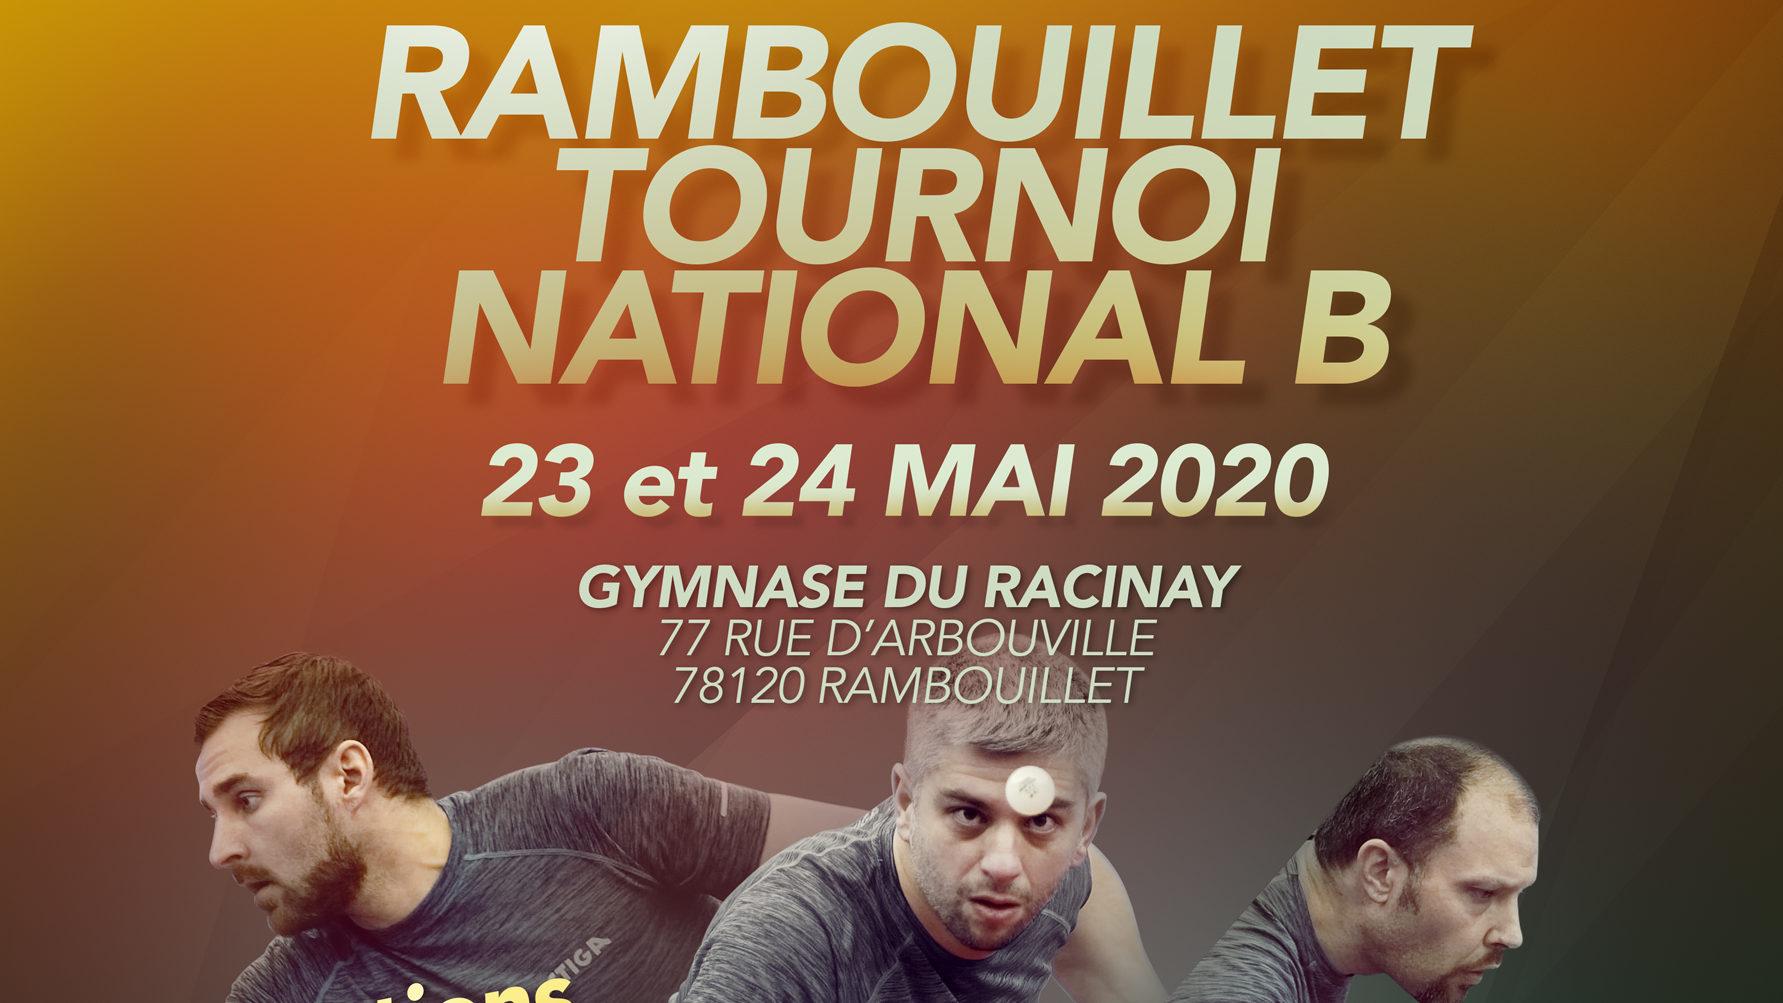 Tournoi National B de Rambouillet